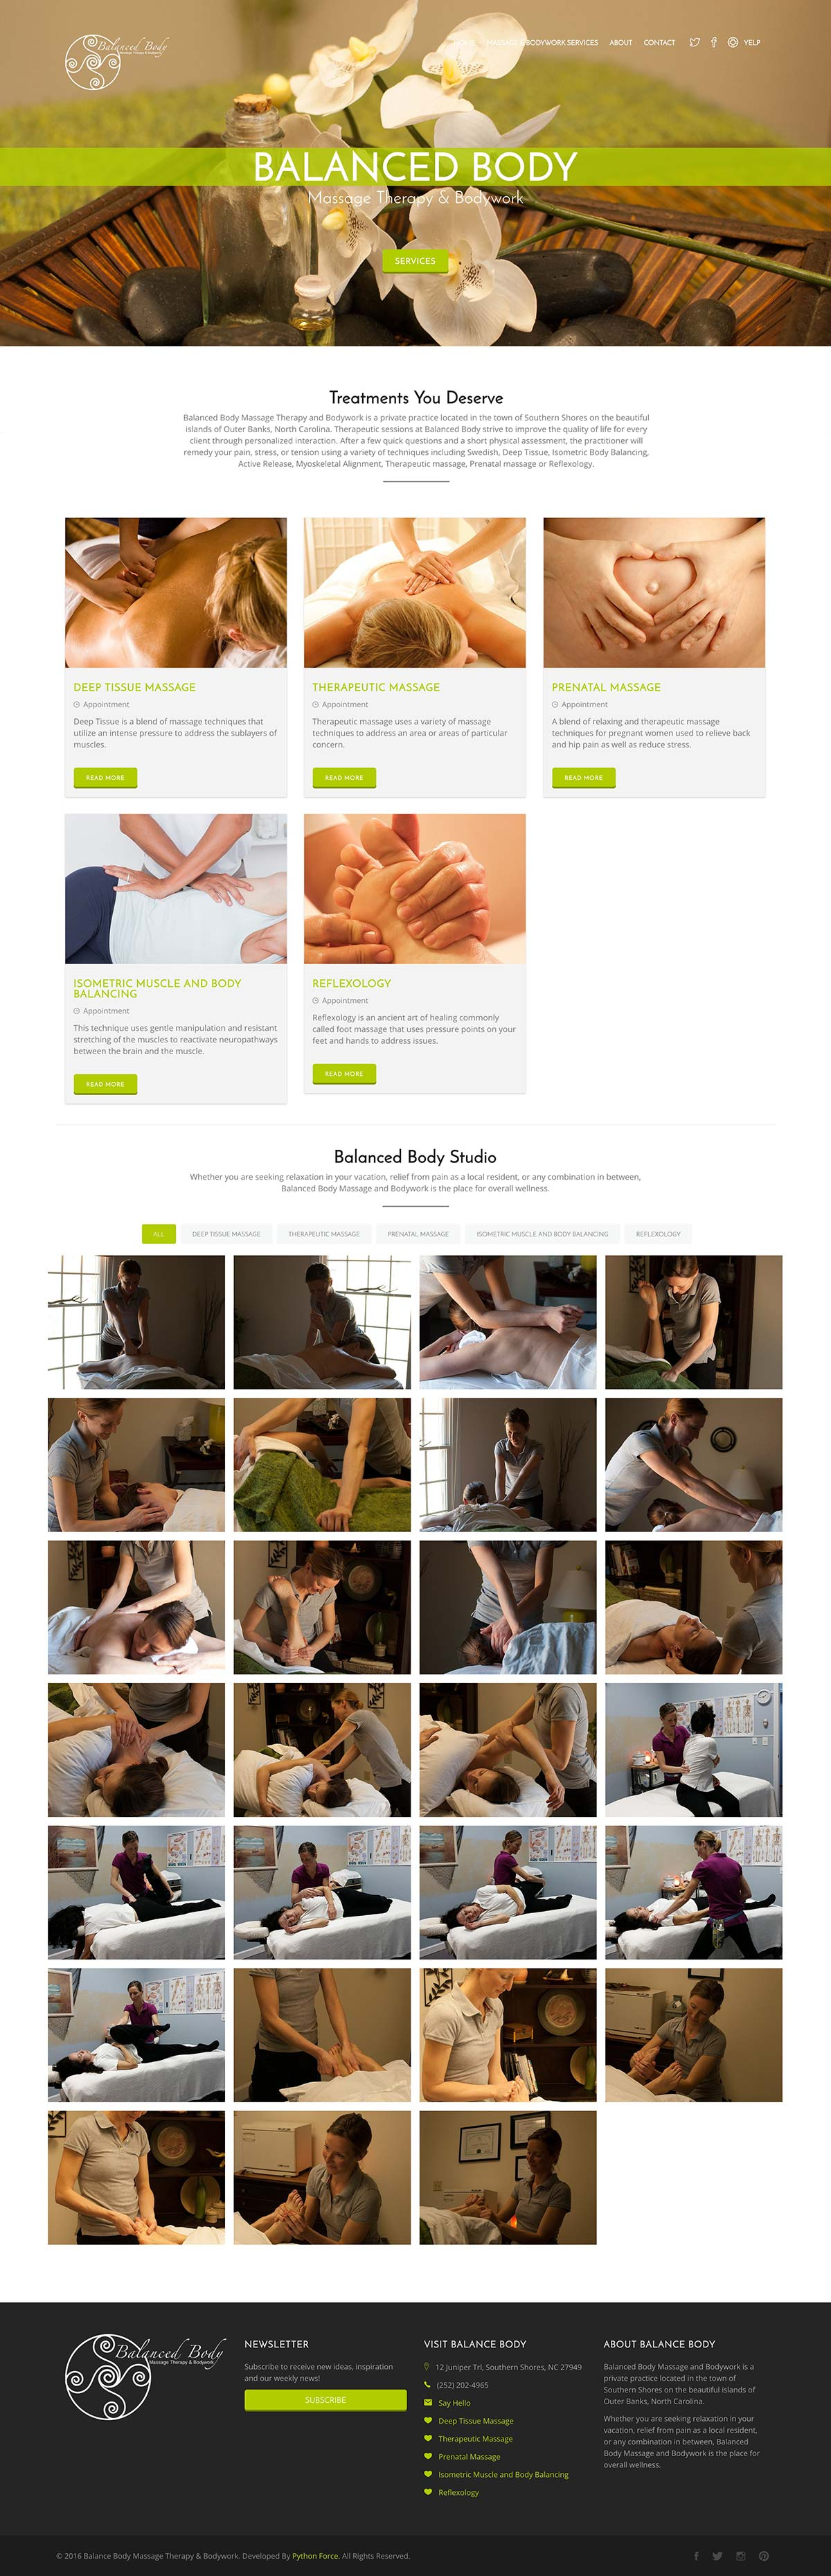 Balanced Body Massage Therapy & Bodywork website